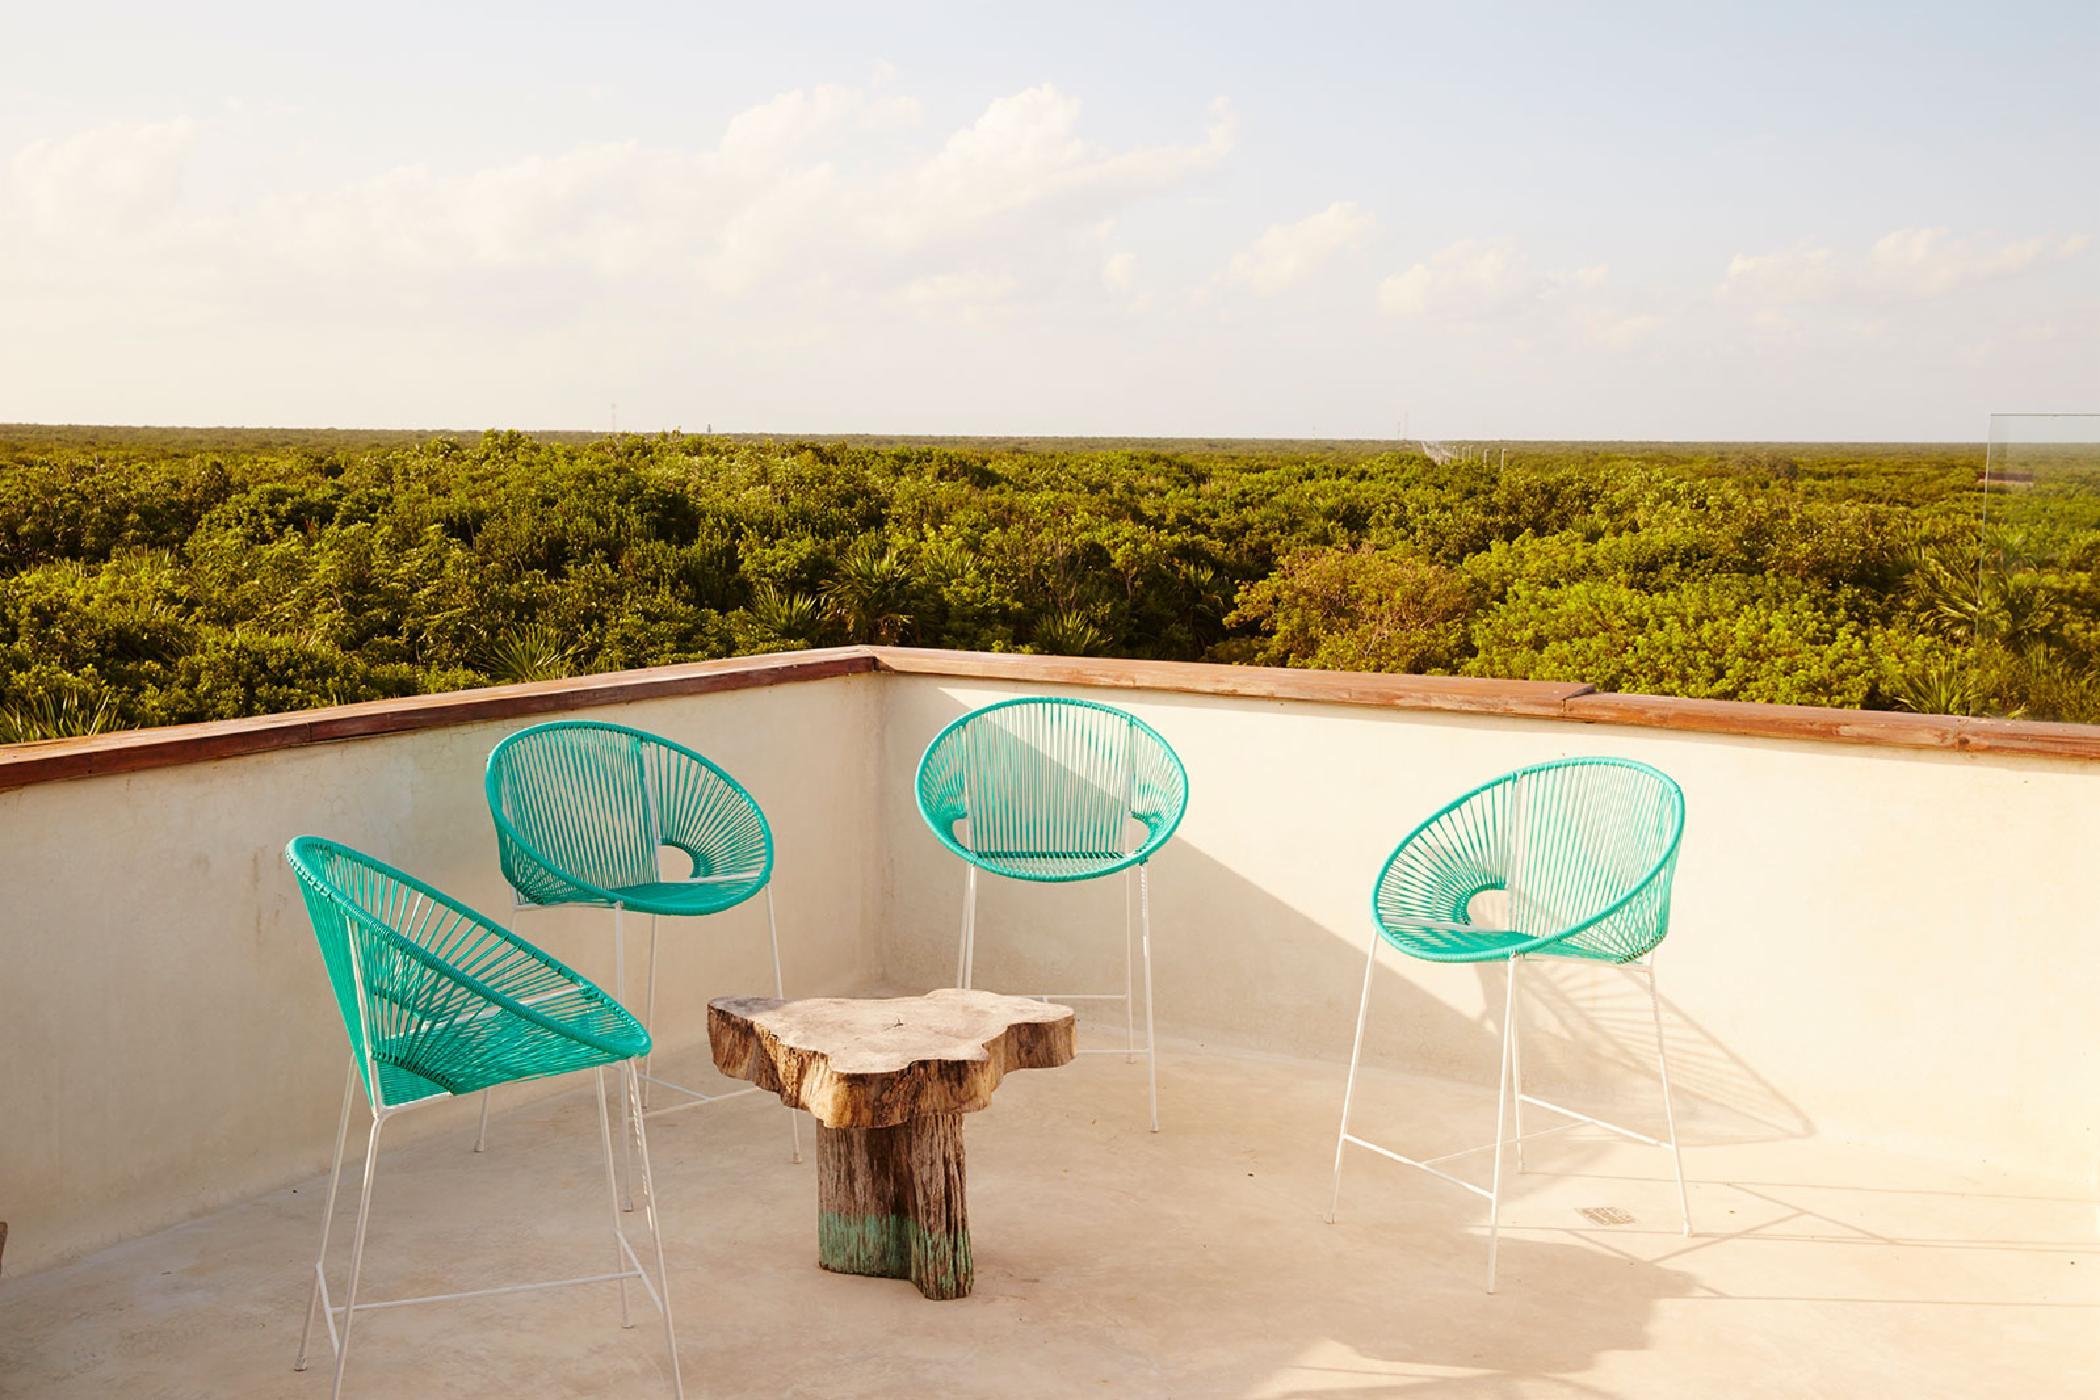 Maya_Luxe_Riviera_Maya_Luxury_Villas_Experiences_Hotel_Zone_Tulum_Beach_5_Bedrooms_Casa_Palapa_20.jpg